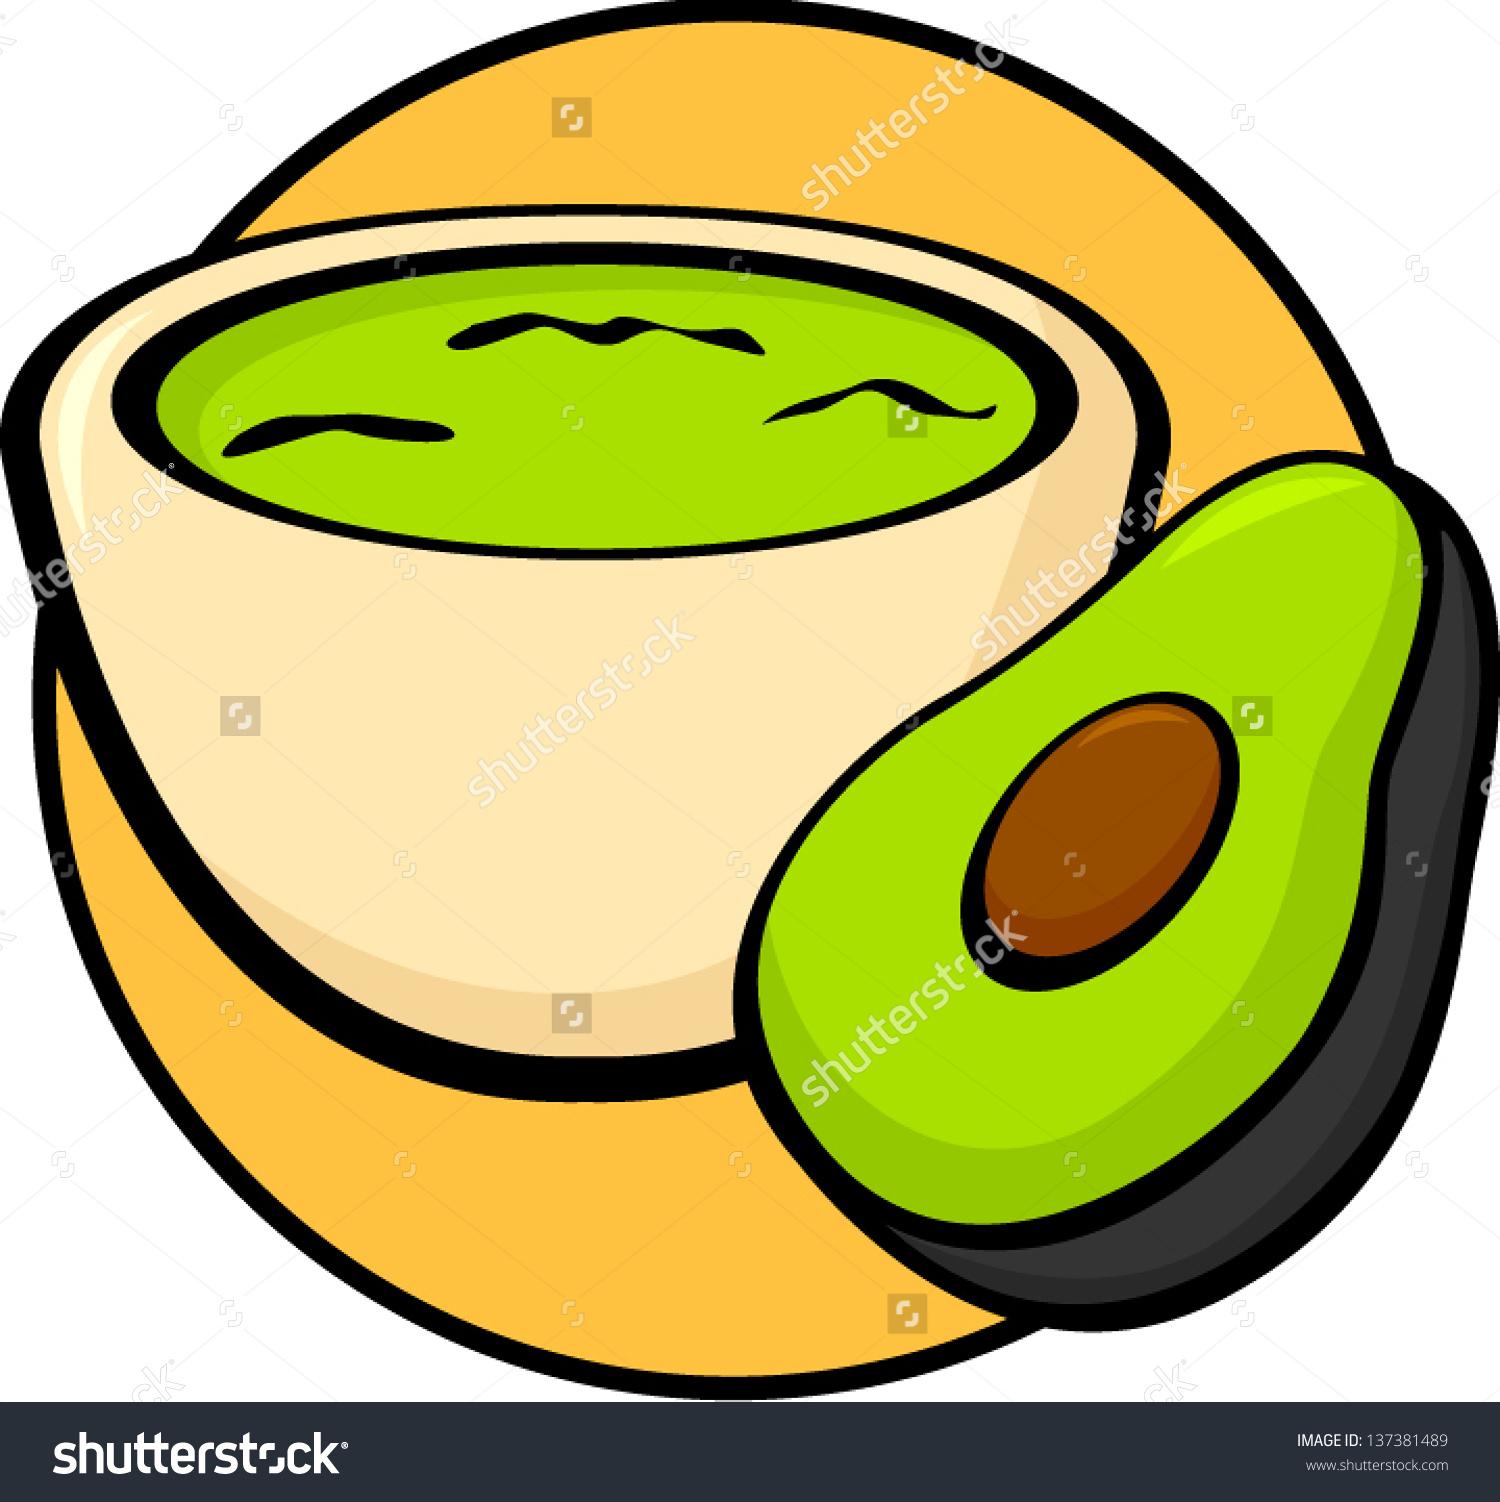 Guacamole Avocado Stock Vector 137381489.